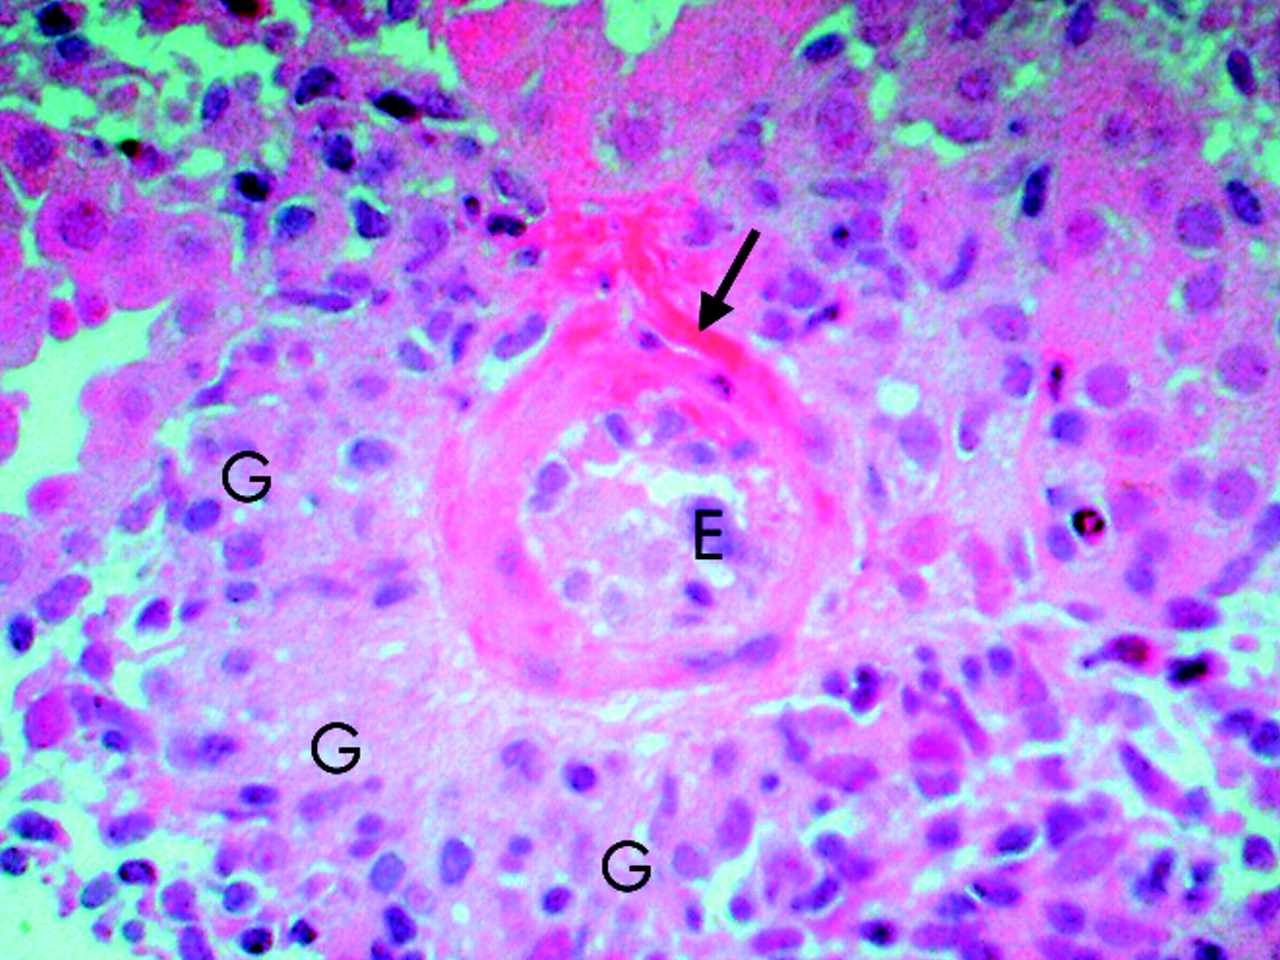 Pathology Outlines - Henoch-Schonlein purpura